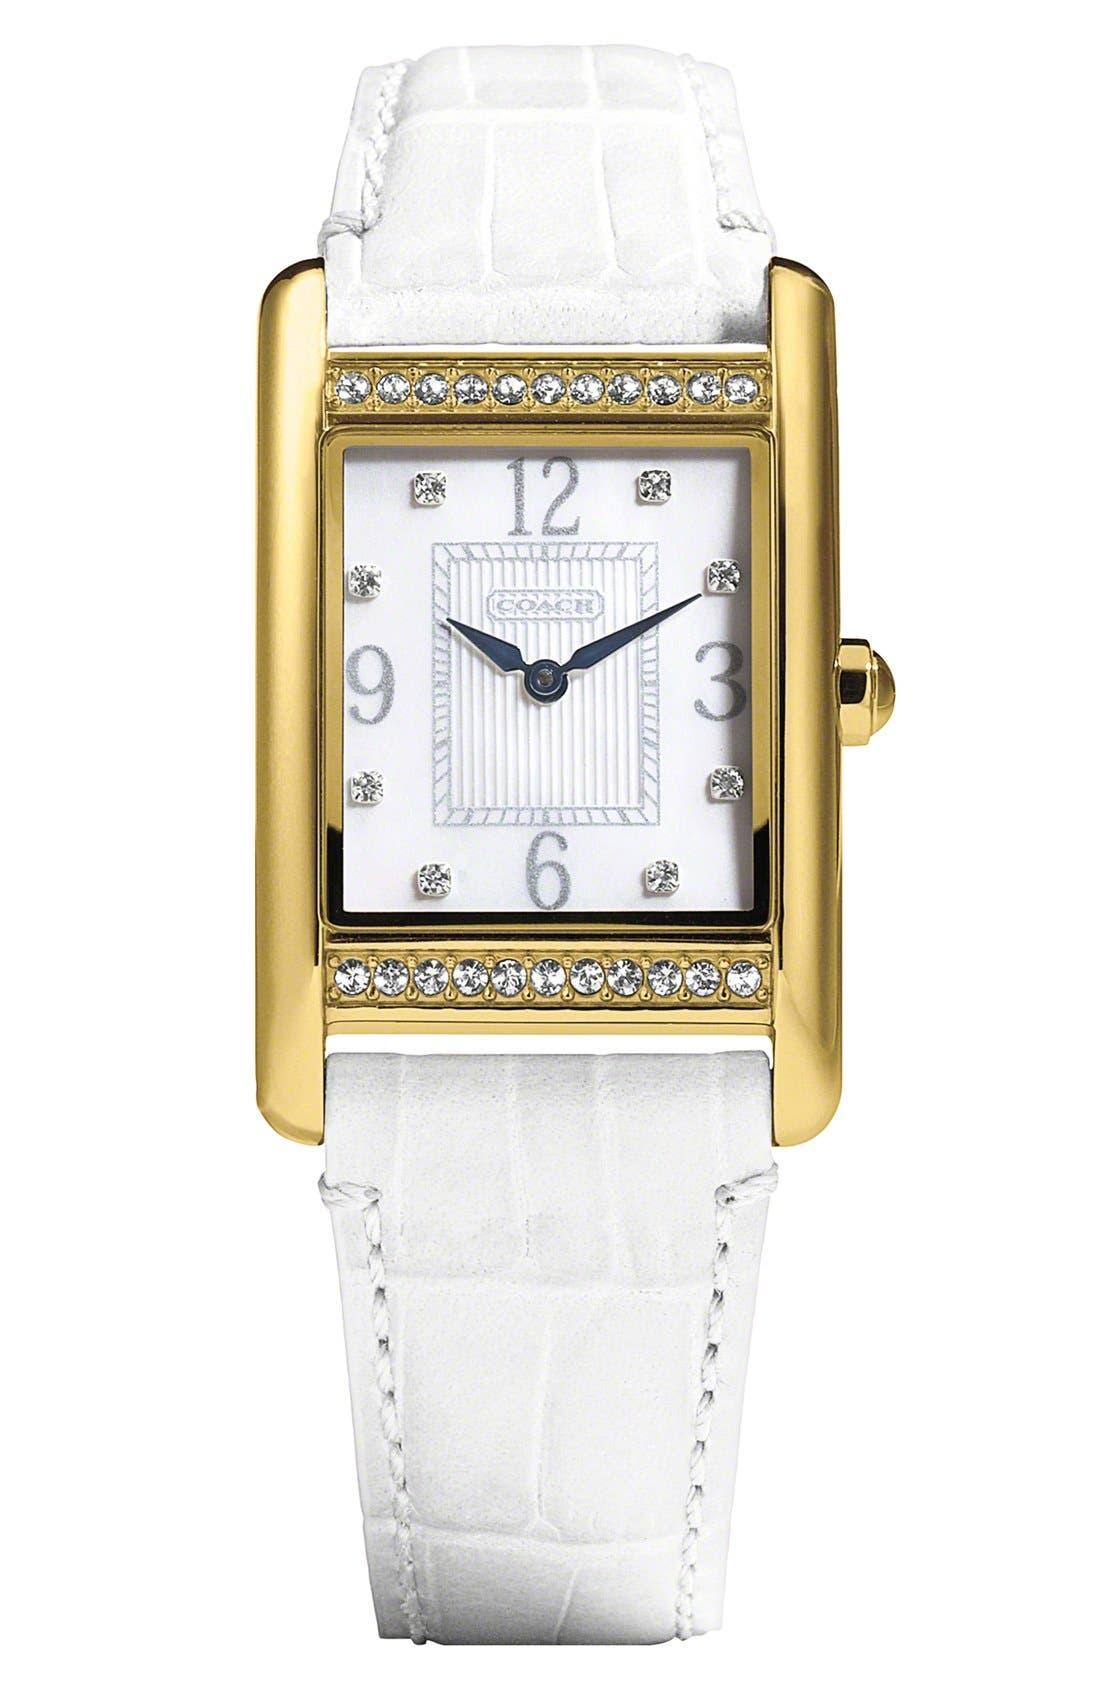 Alternate Image 1 Selected - COACH 'Lexington' Crystal Bezel Watch, 25mm x 30mm